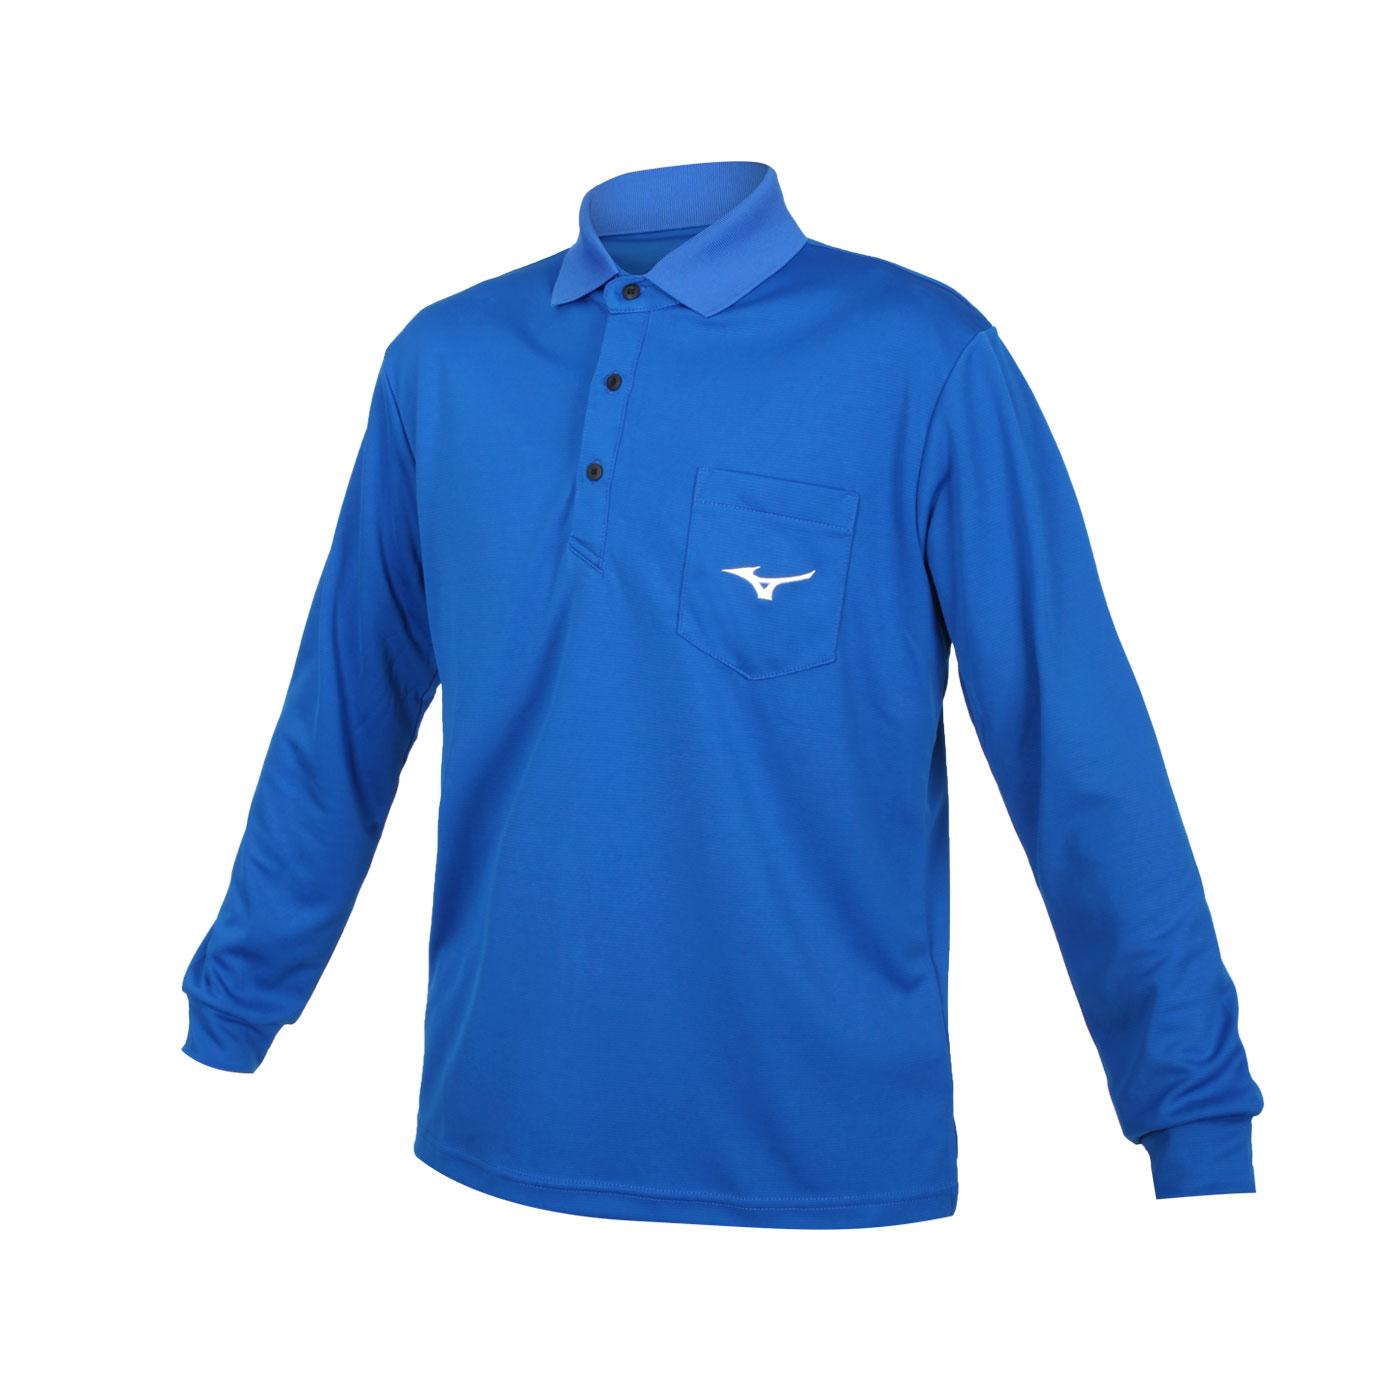 MIZUNO 男款長袖POLO衫 32TA154320 - 藍白